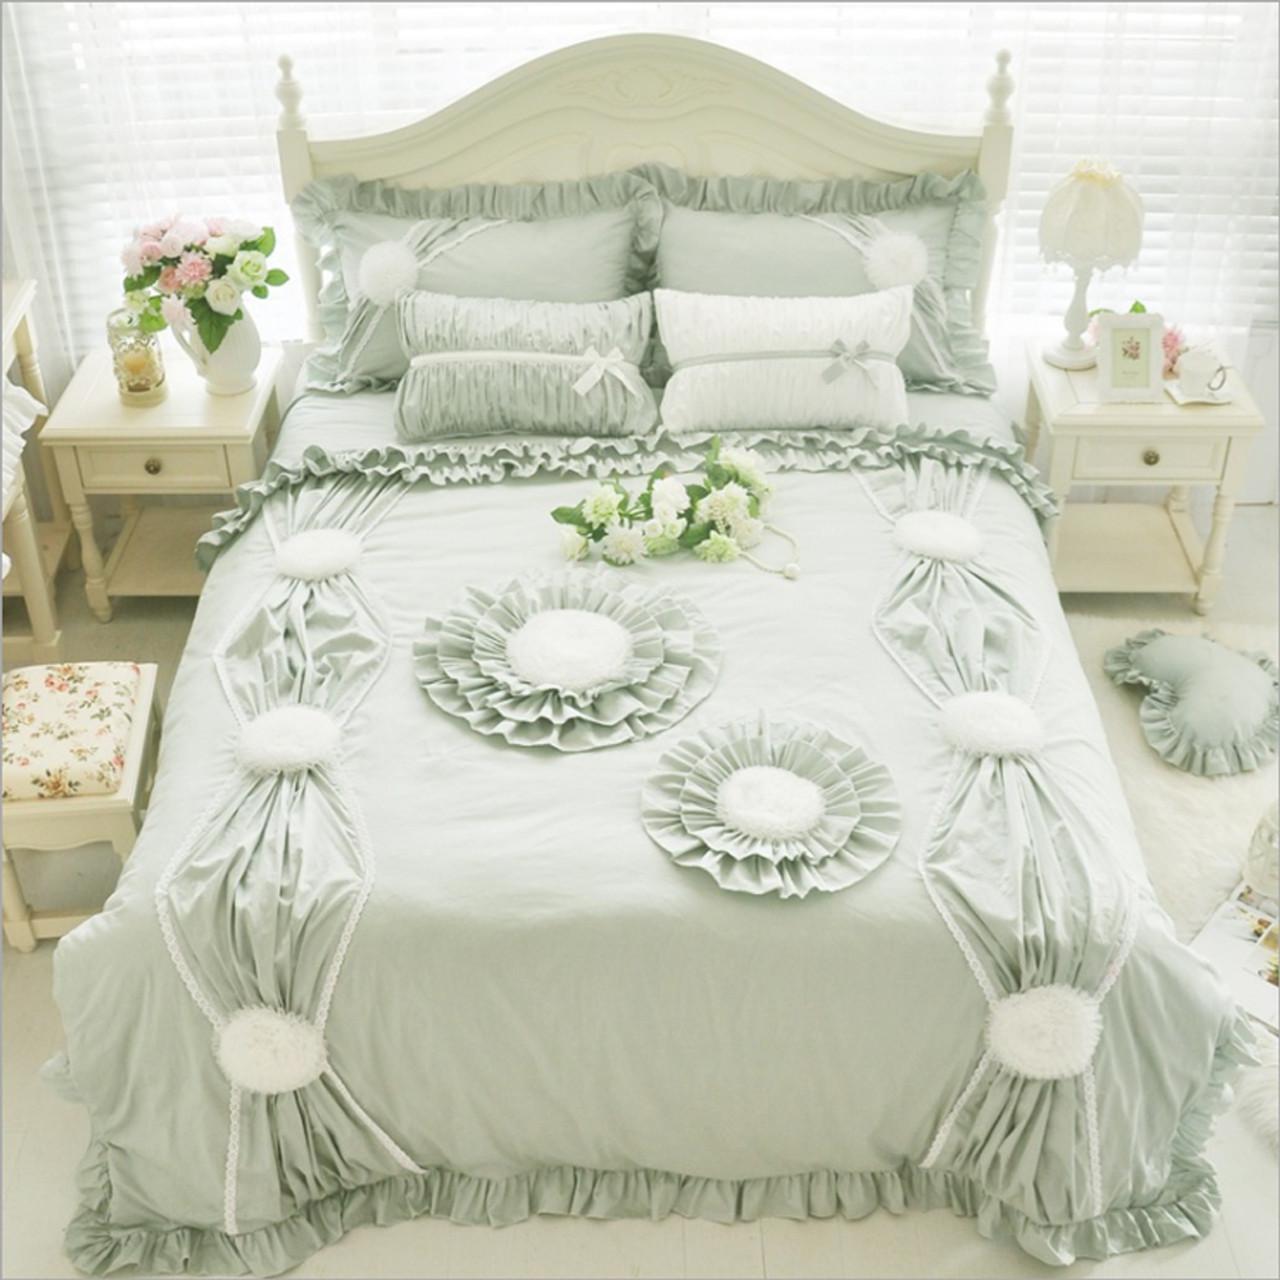 100 Cotton Korean Princess Style Handmade Lace Flowers Fold Lace Design Duvet Cover Bed Sheet Set White Pink Green Bedding Set Onshopdeals Com